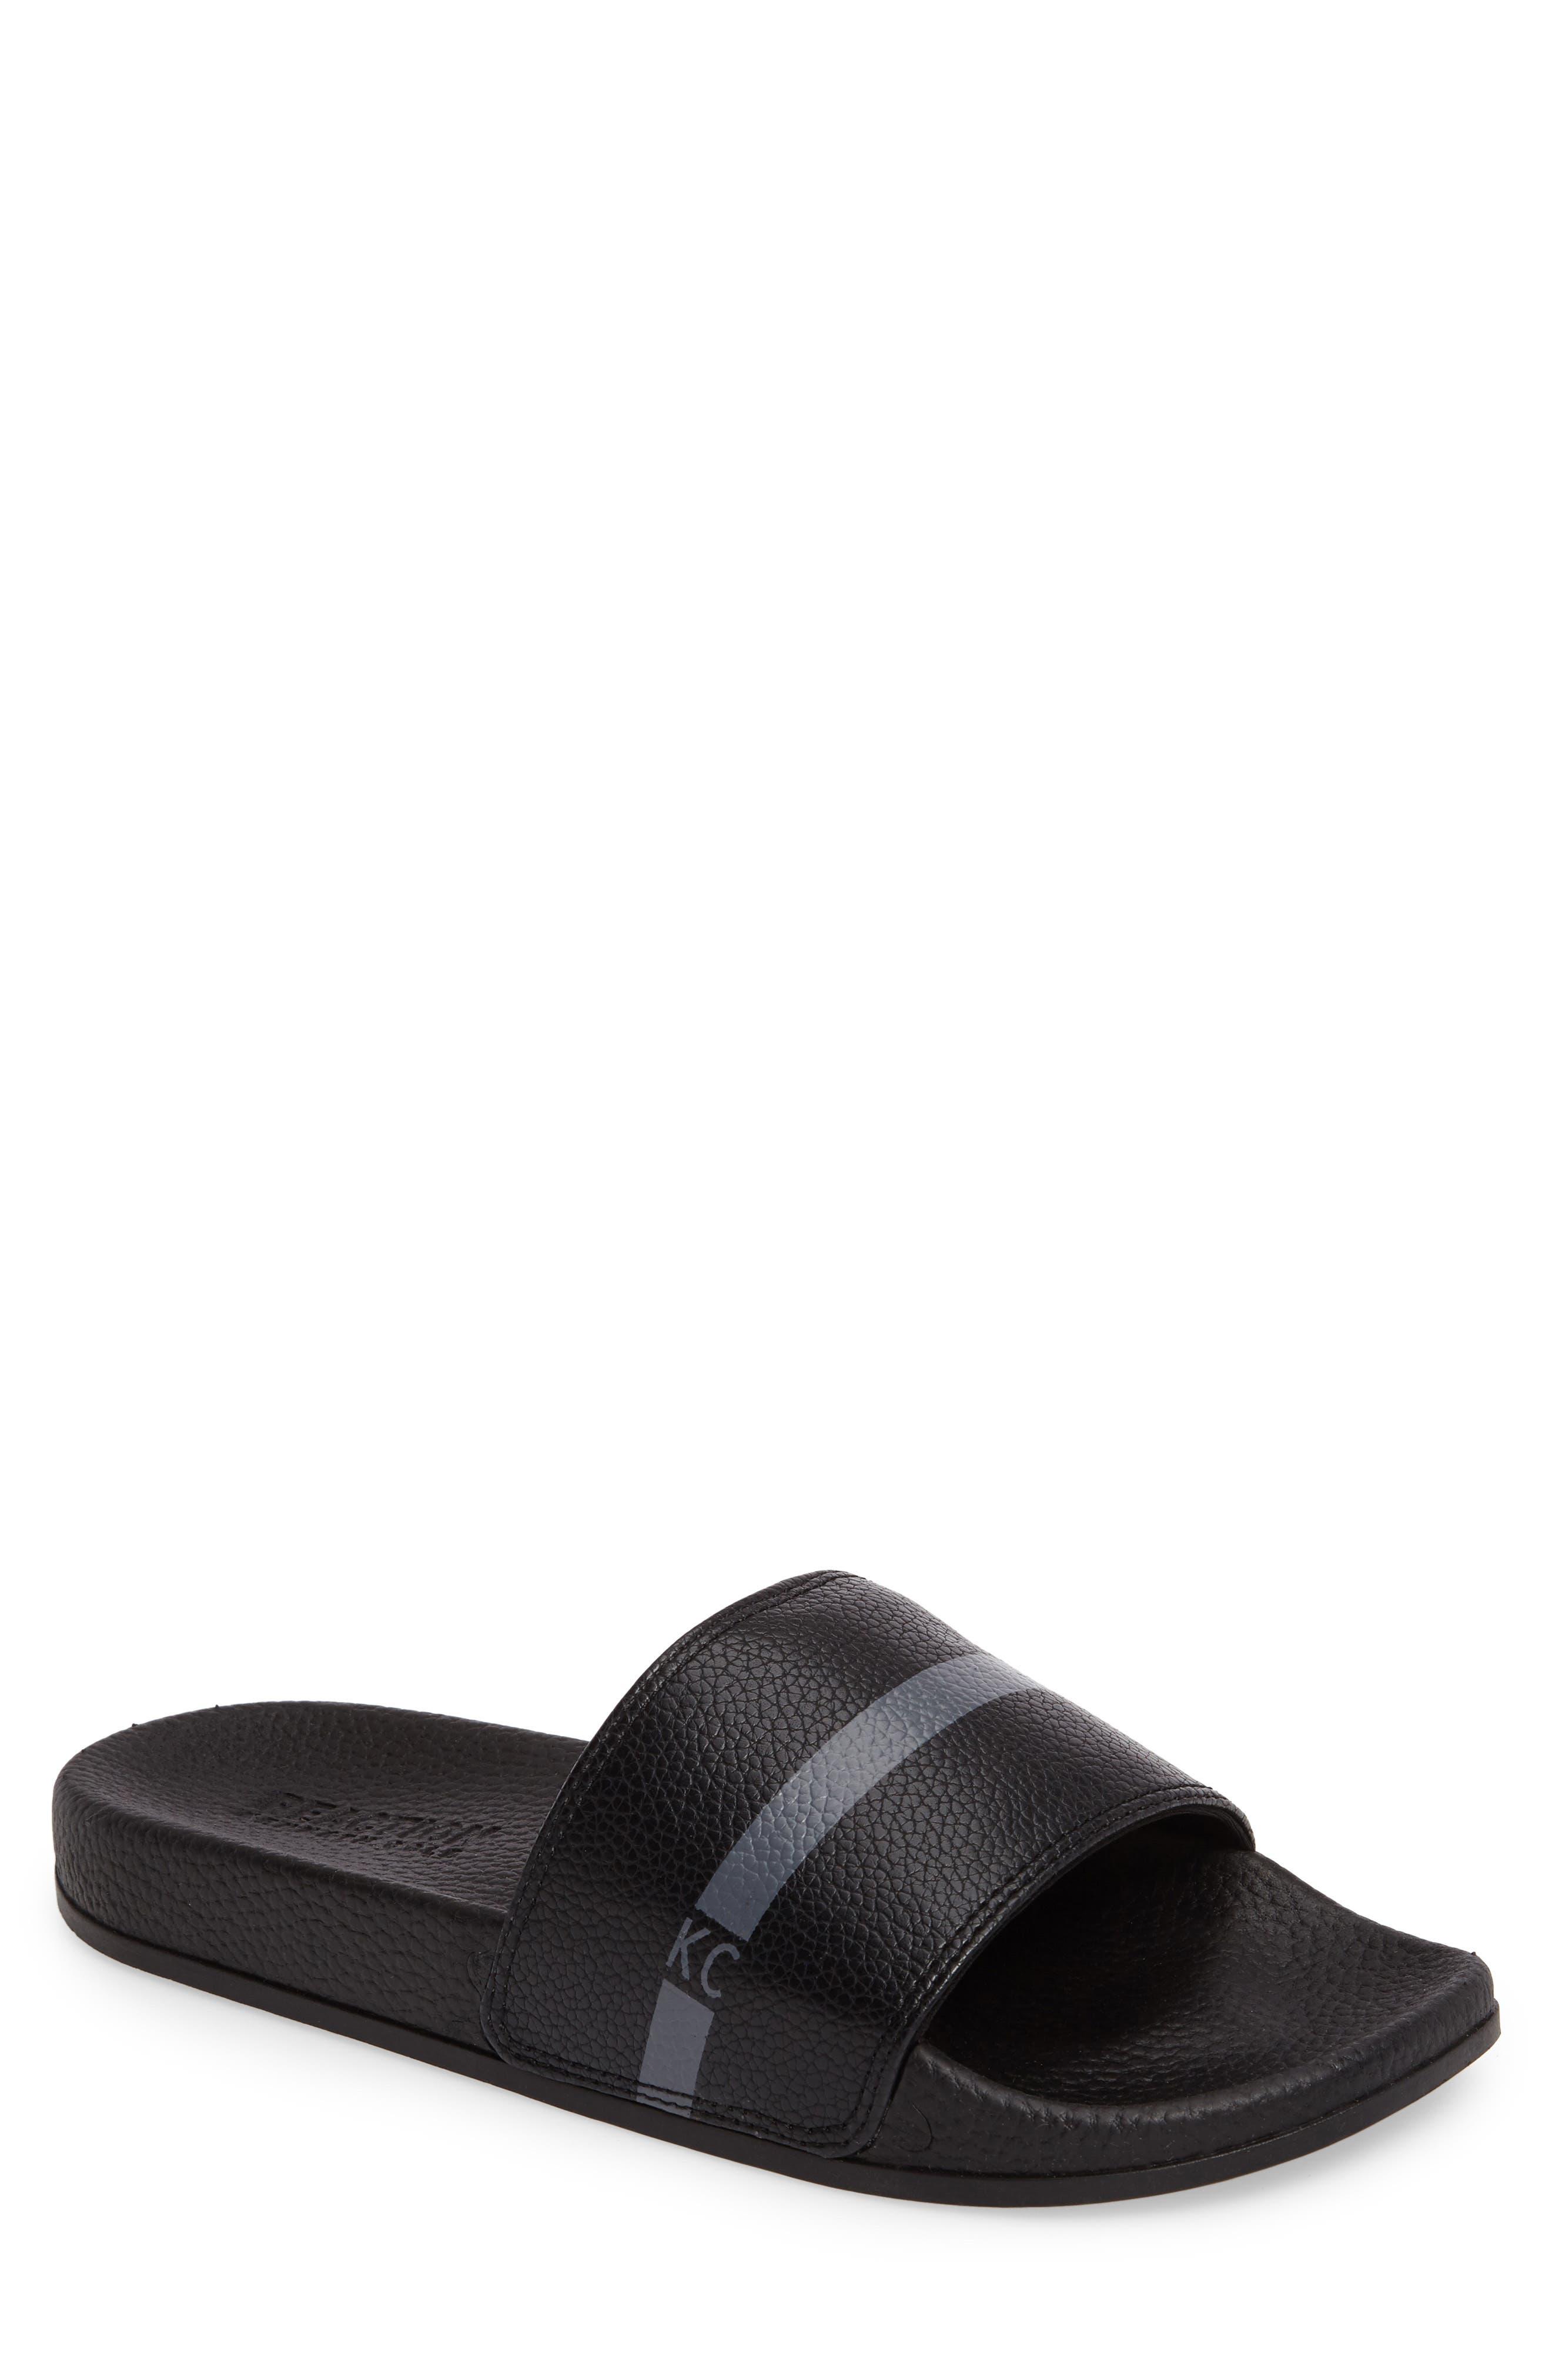 Big Screen Slide Sandal,                         Main,                         color, Black